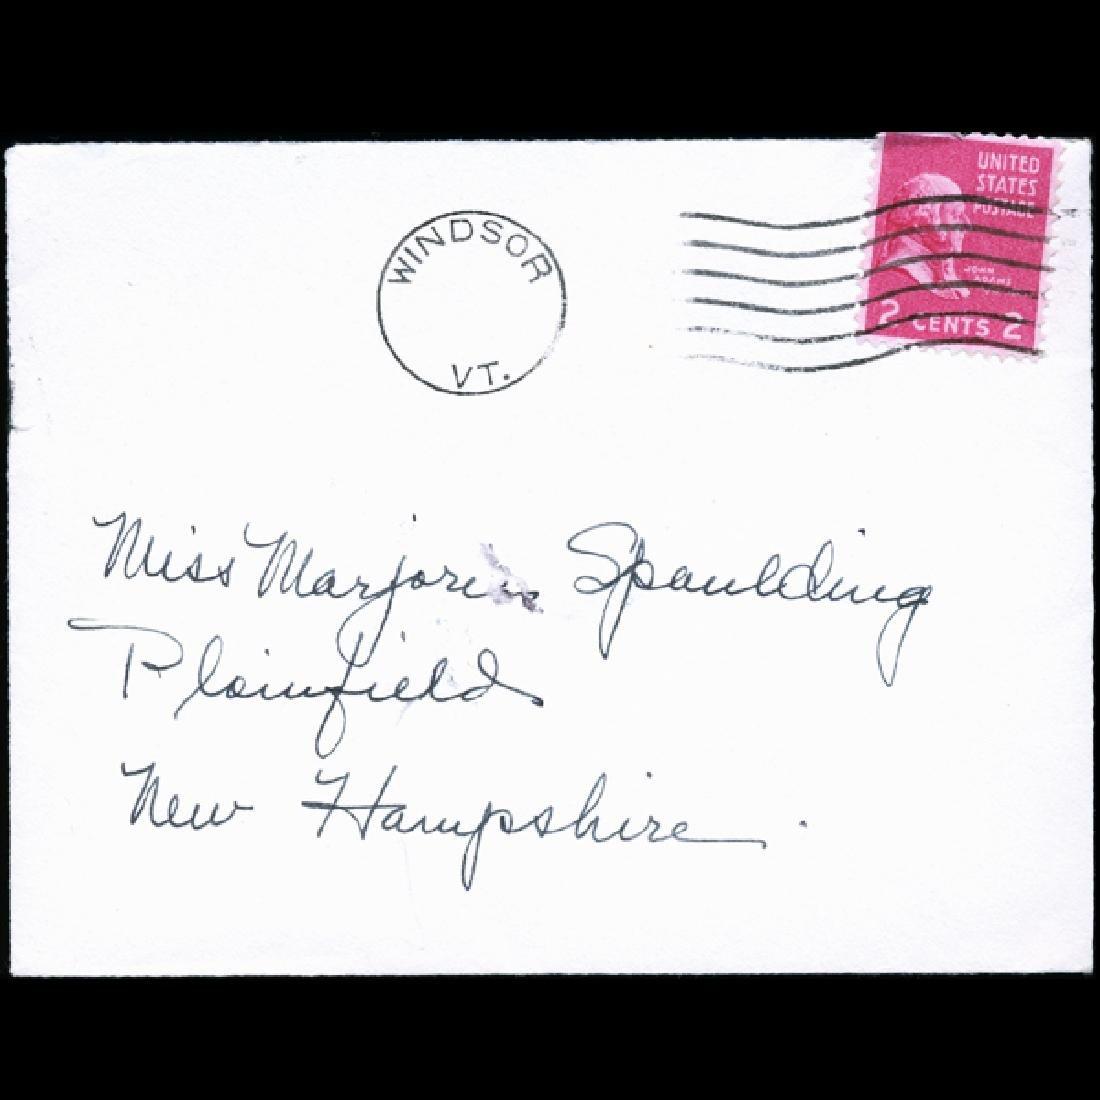 195? US Precancelled Postal Cover